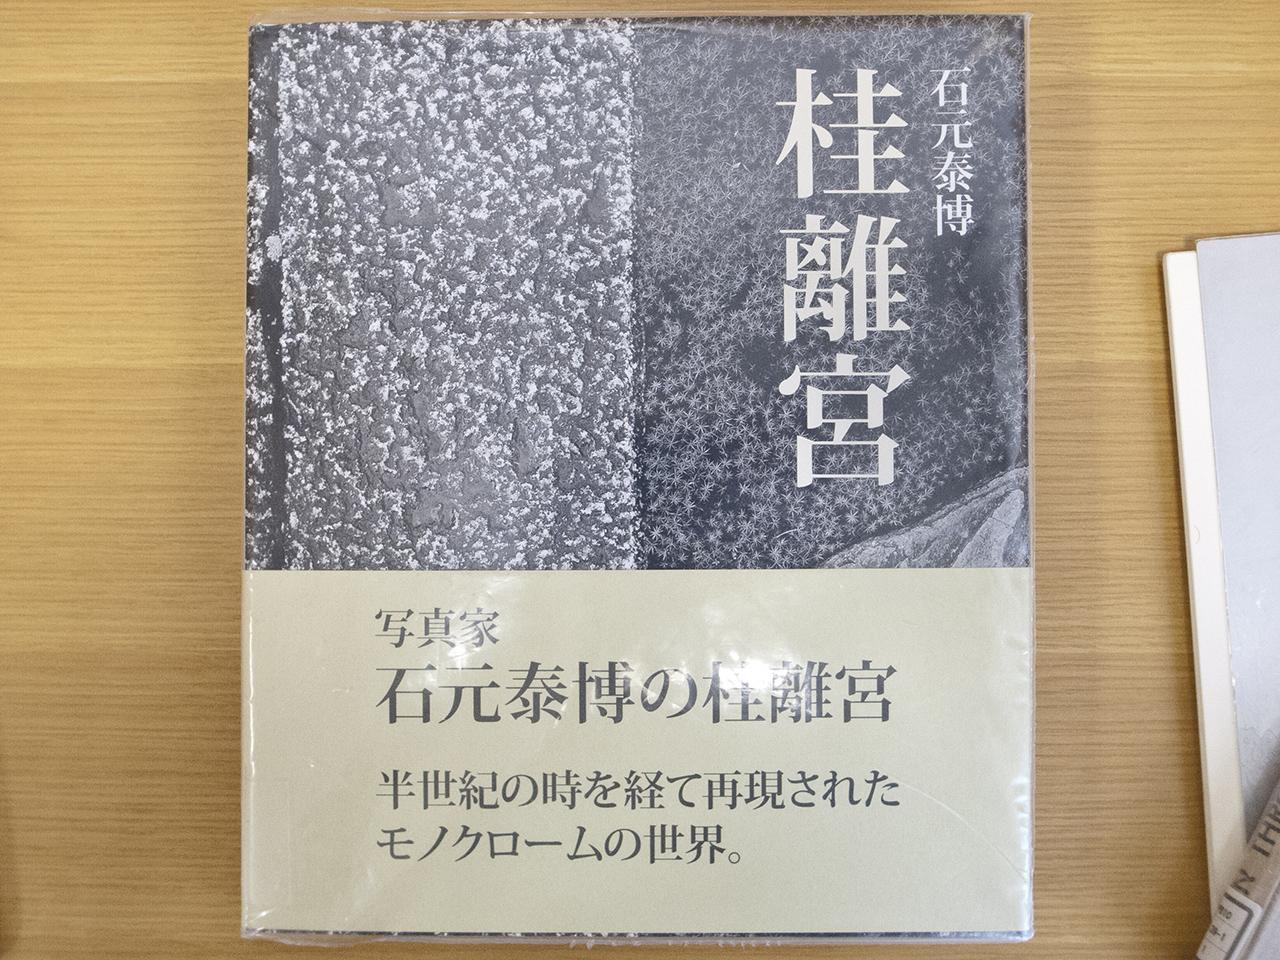 Jesse's Book Review – Katsura by Yasuhiro Ishimoto